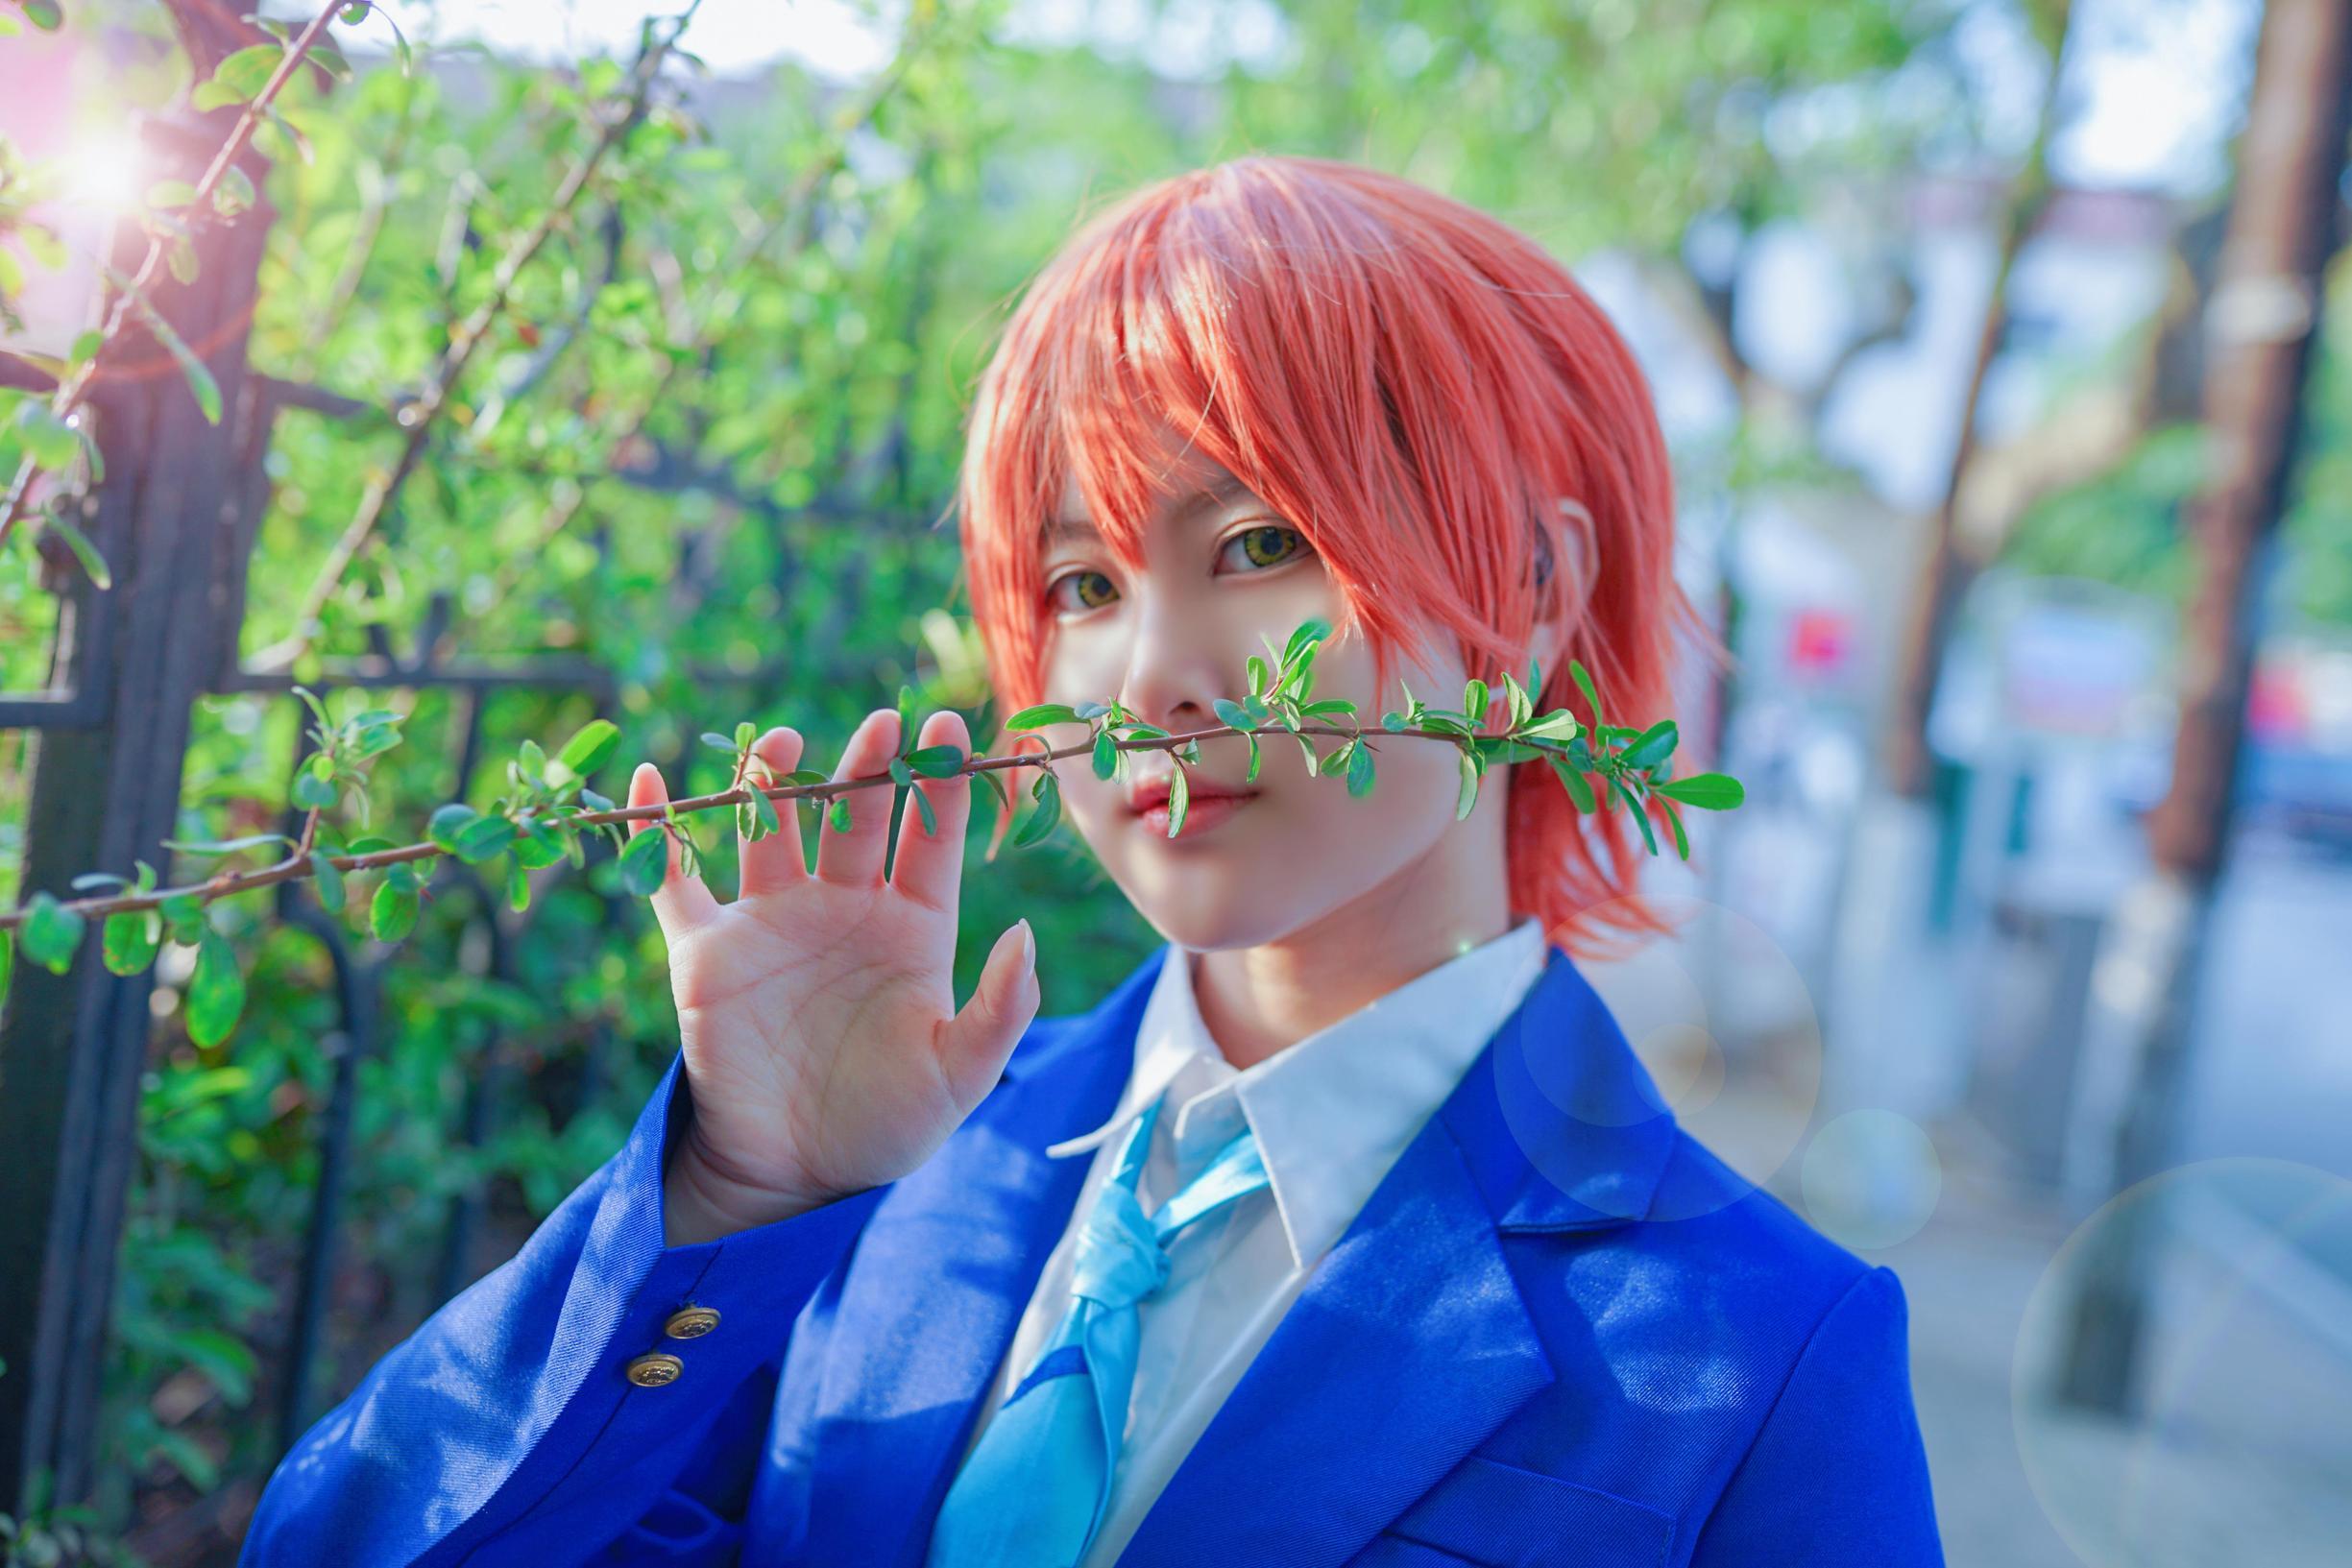 《LOVE LIVE!》正片cosplay【CN:_李笑颜Lee】-第10张